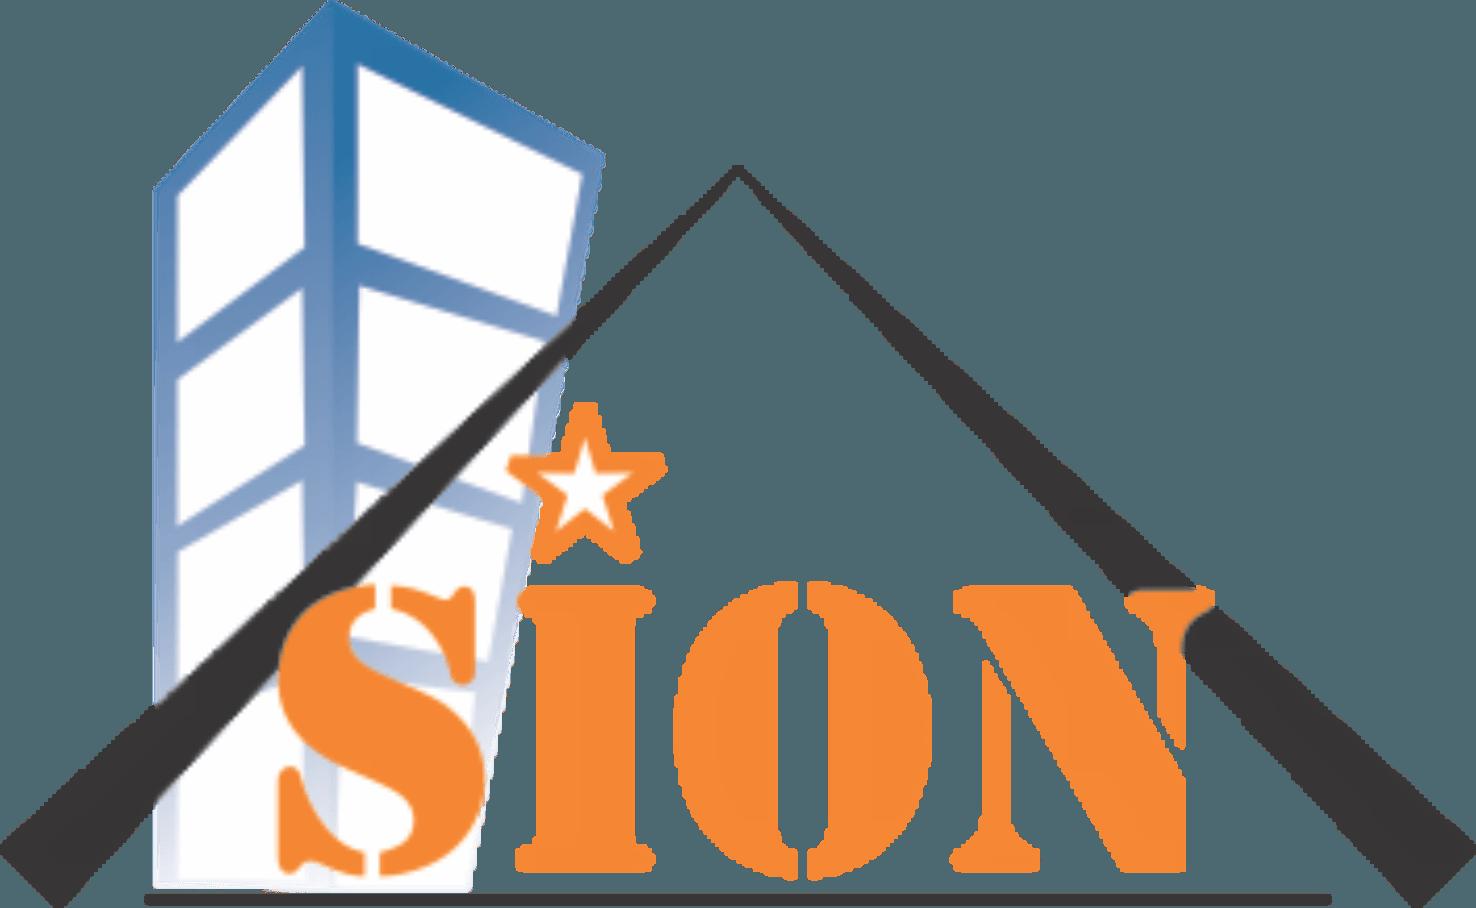 Logo Sion Construction Surabaya Pelayanan Terbaik Renovasi RUmah SUrabaya Konsultasi Gratis